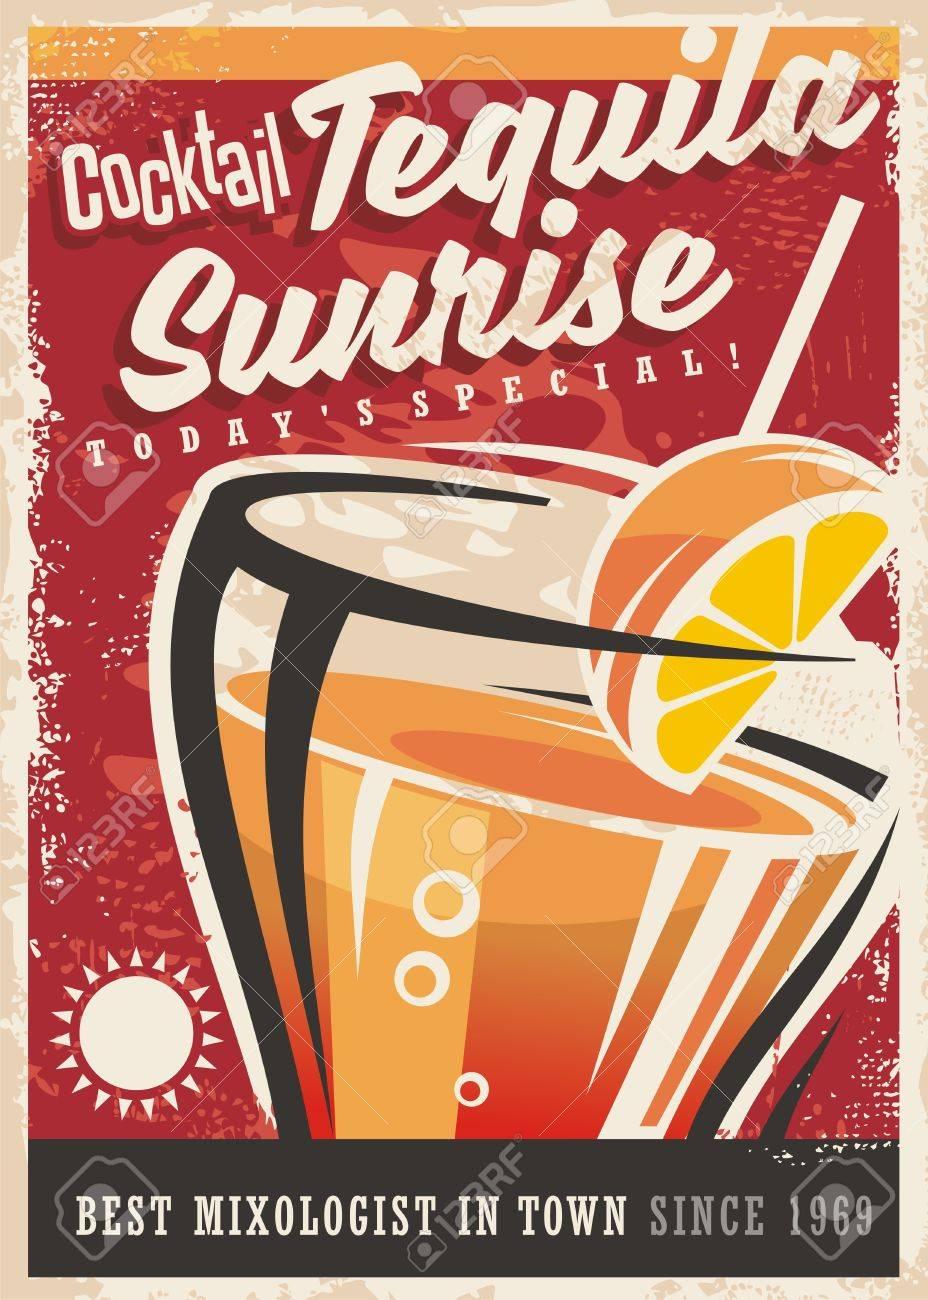 cocktail tequila sunrise retro promotional poster design vintage